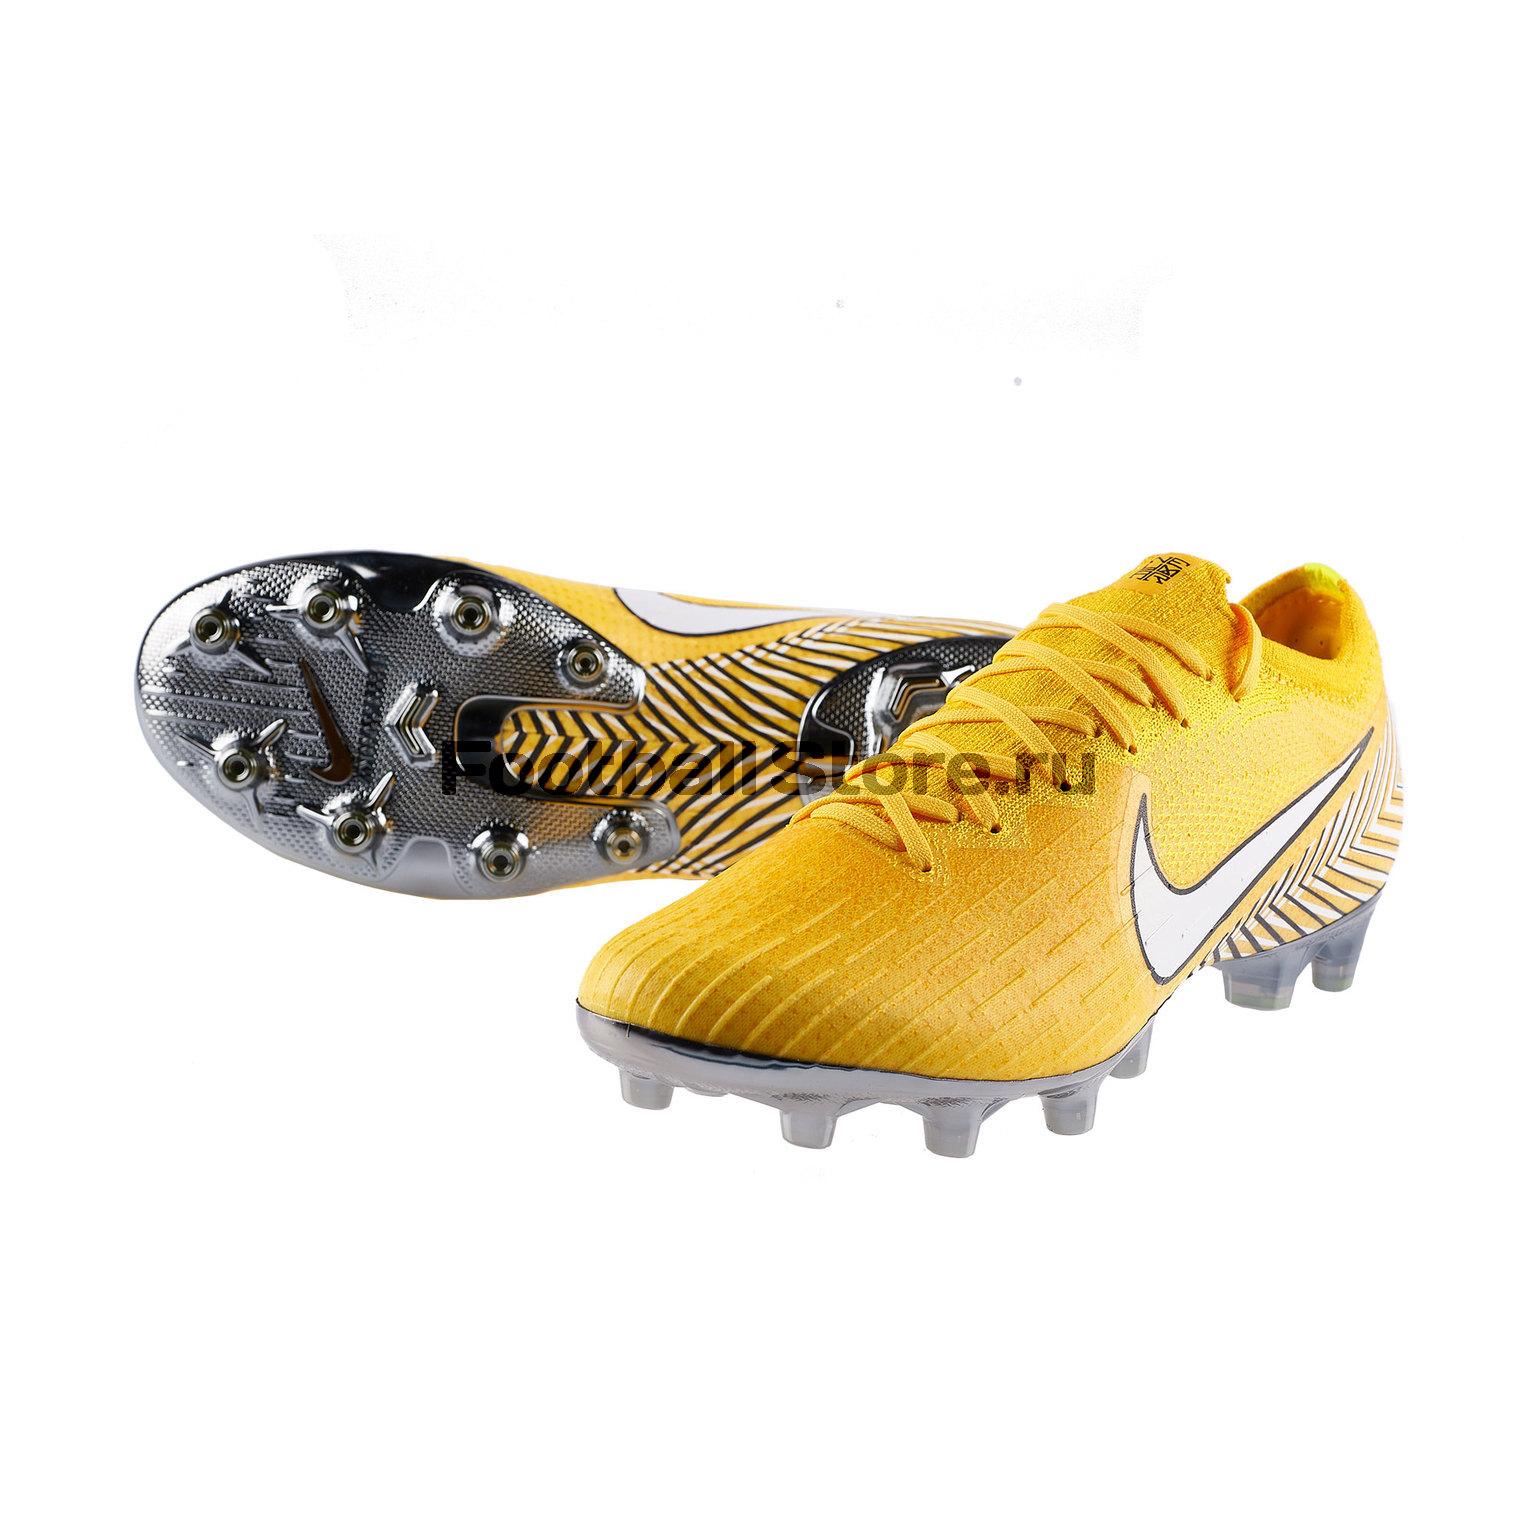 d9e7e64b Бутсы Nike Vapor 12 Elite Neymar AG-Pro AO3128-710 – купить бутсы в ...